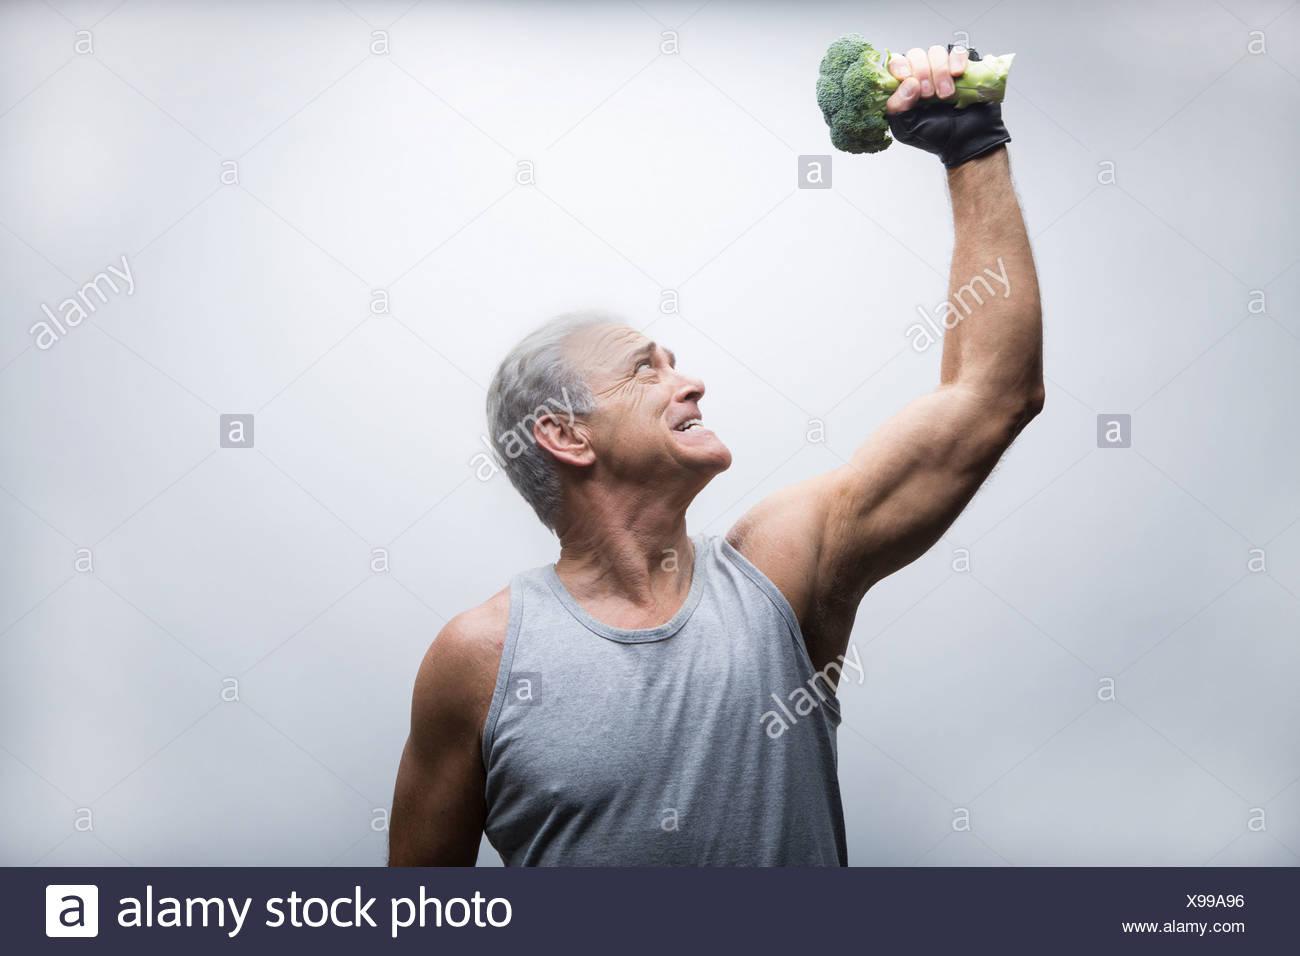 Senior man looking up and lifting broccoli - Stock Image